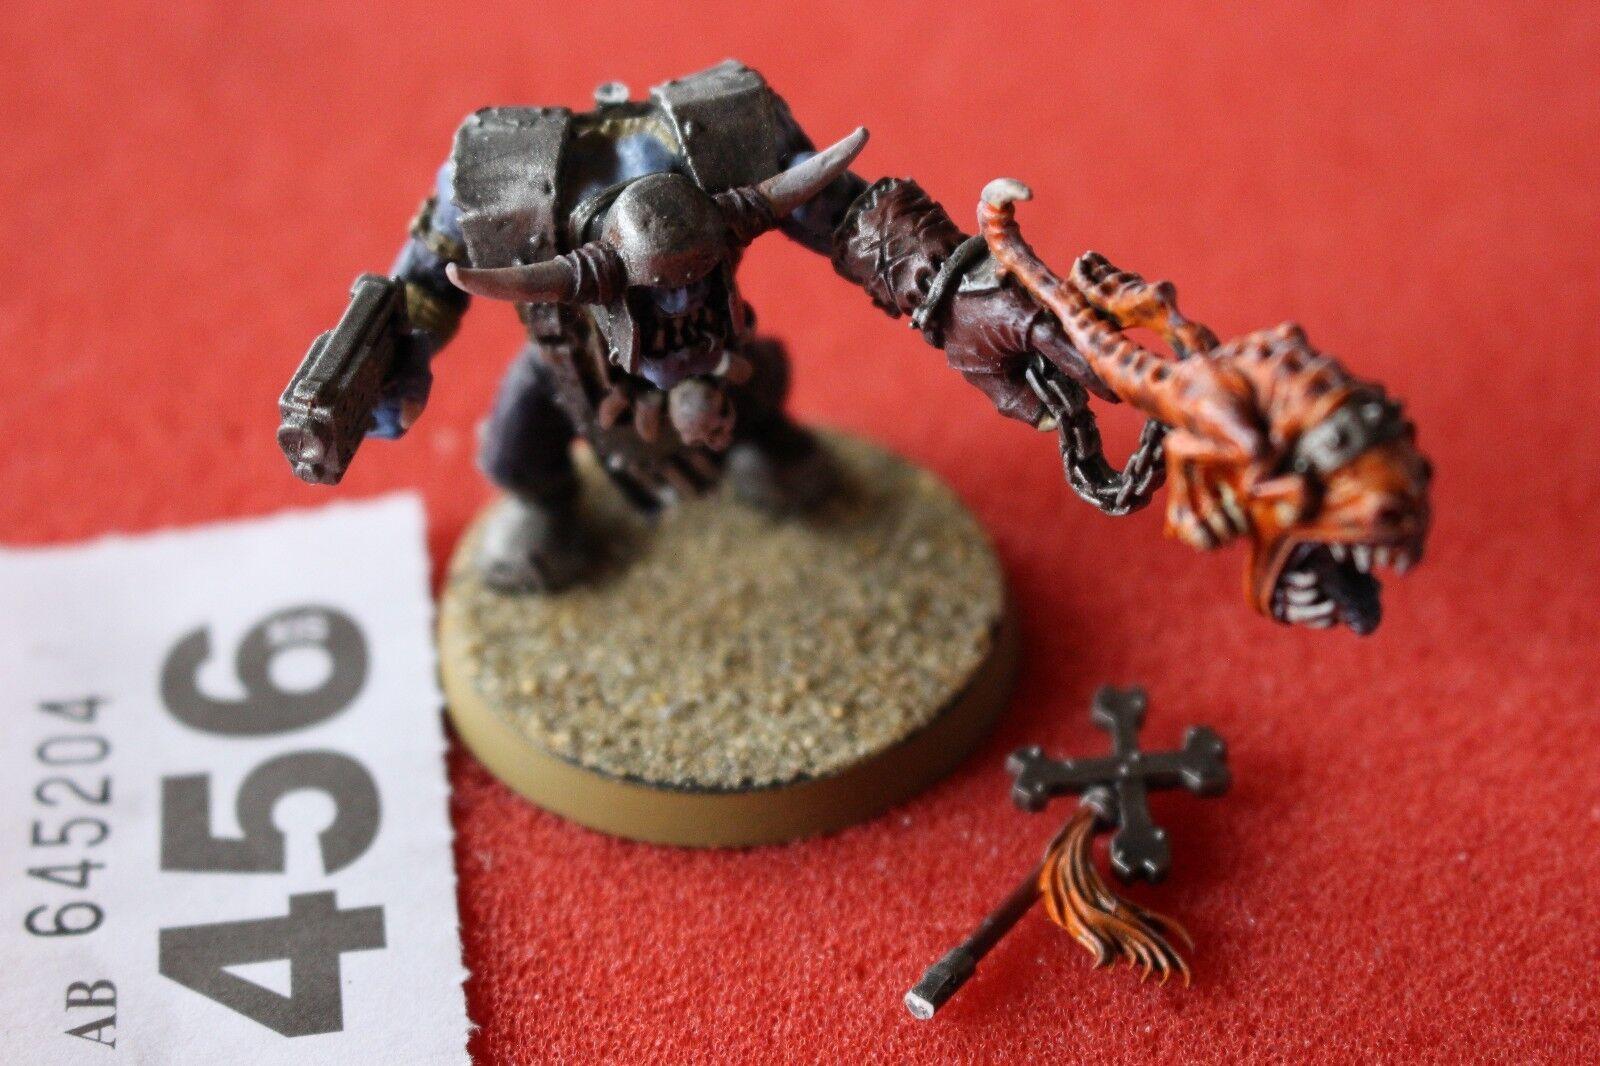 Juegos taller Warhammer 40k Orks Warboss con ataque Squig así figura pintada